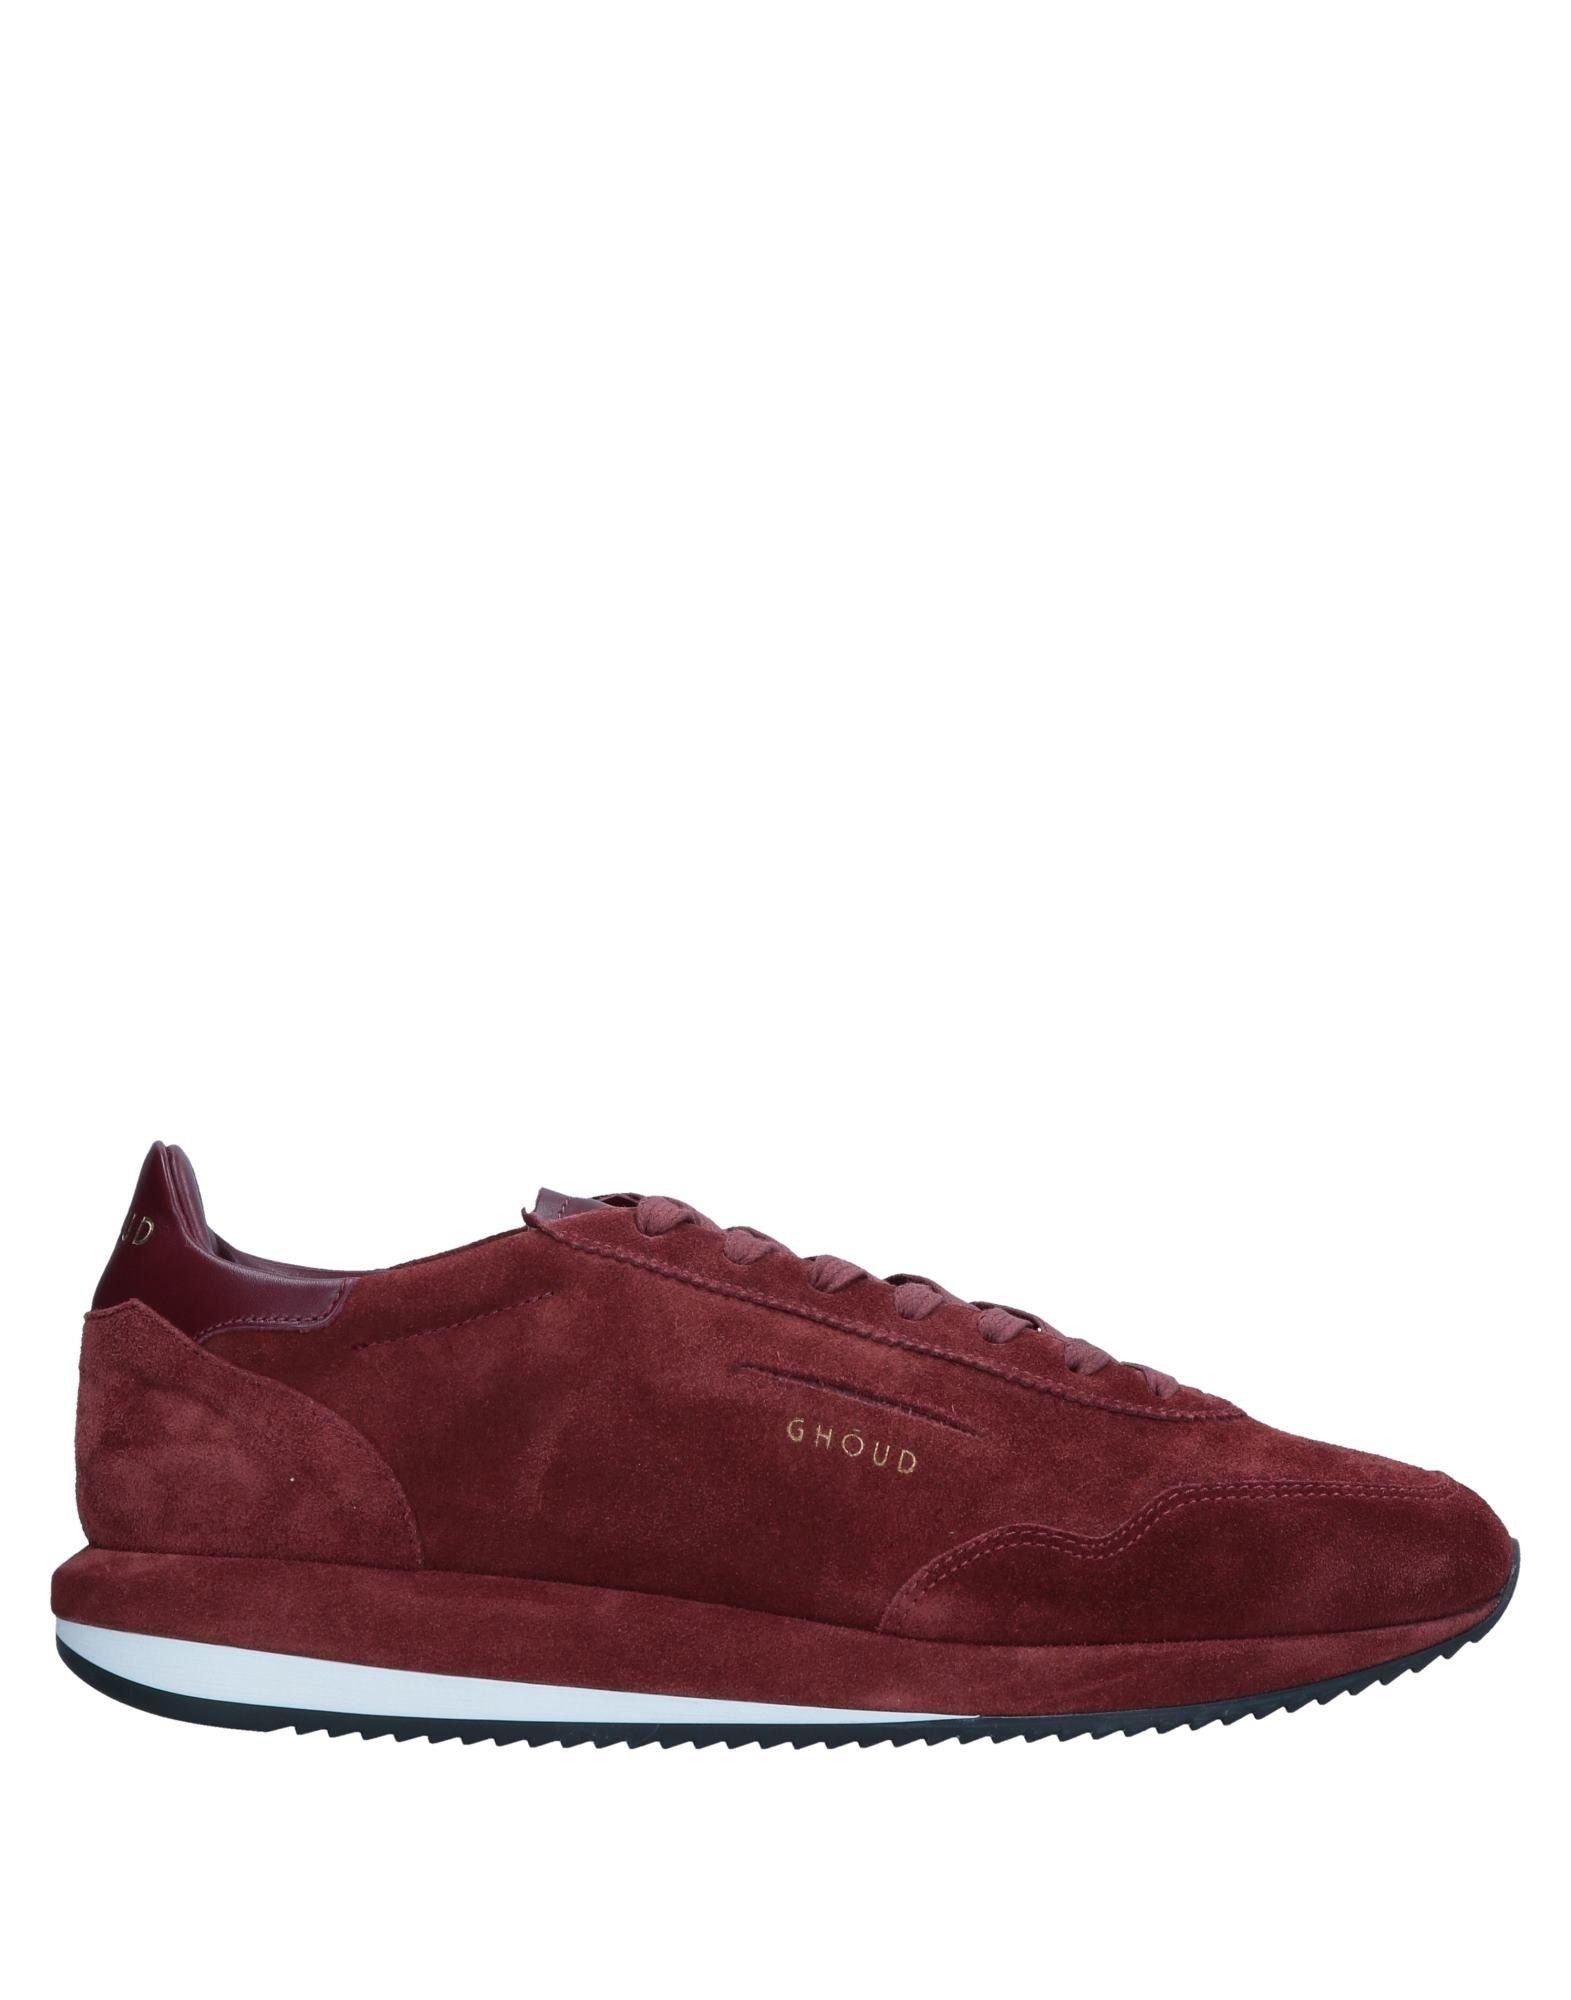 Ghōud Venice Sneakers Herren  11545423BI Gute Qualität beliebte Schuhe